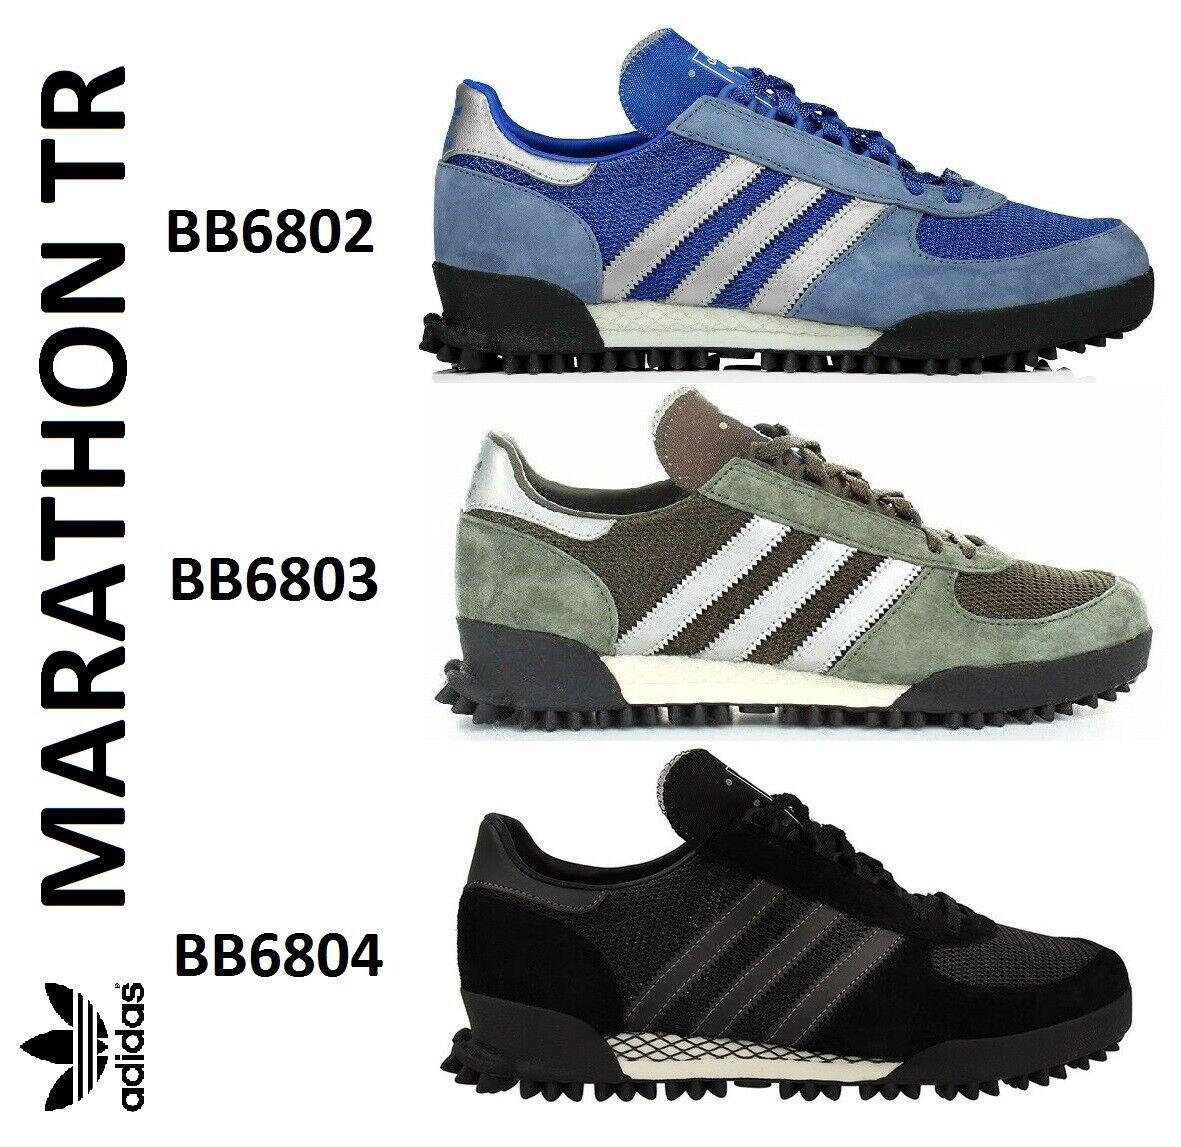 ADIDAS ORIGINALS MARATHON TR BB6802 BB6802 BB6802 BB6803